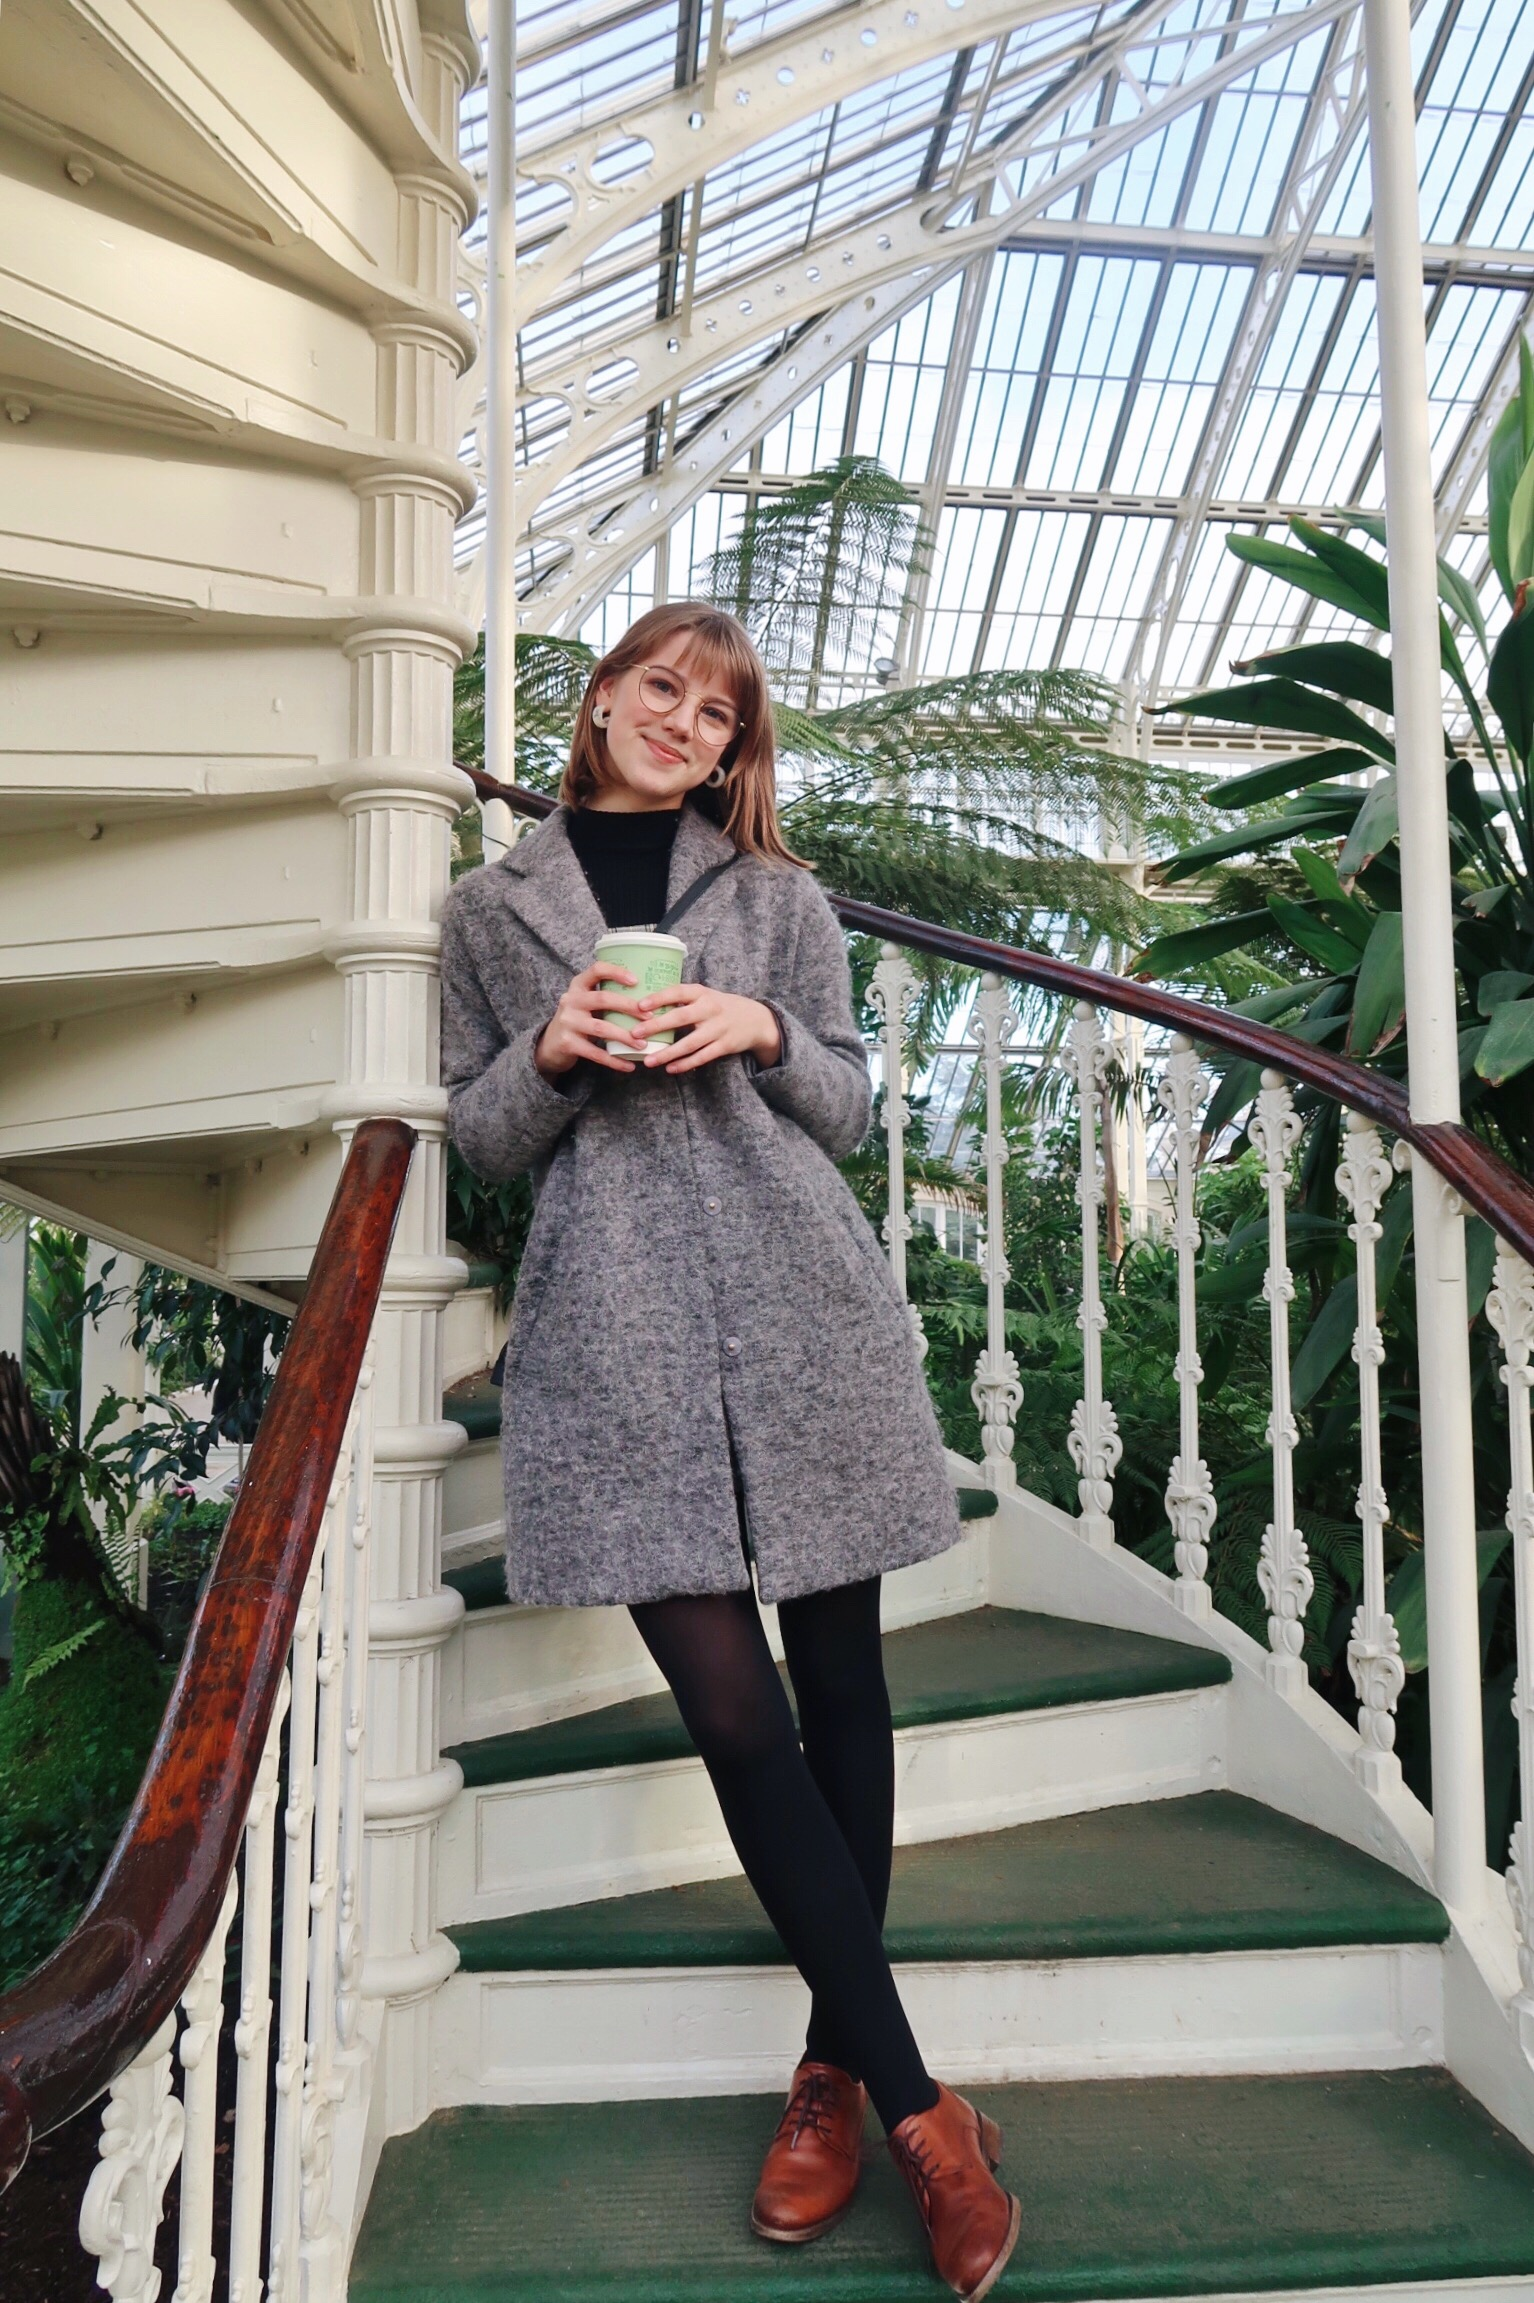 Martine in London | Image courtesy of Martine Skaret